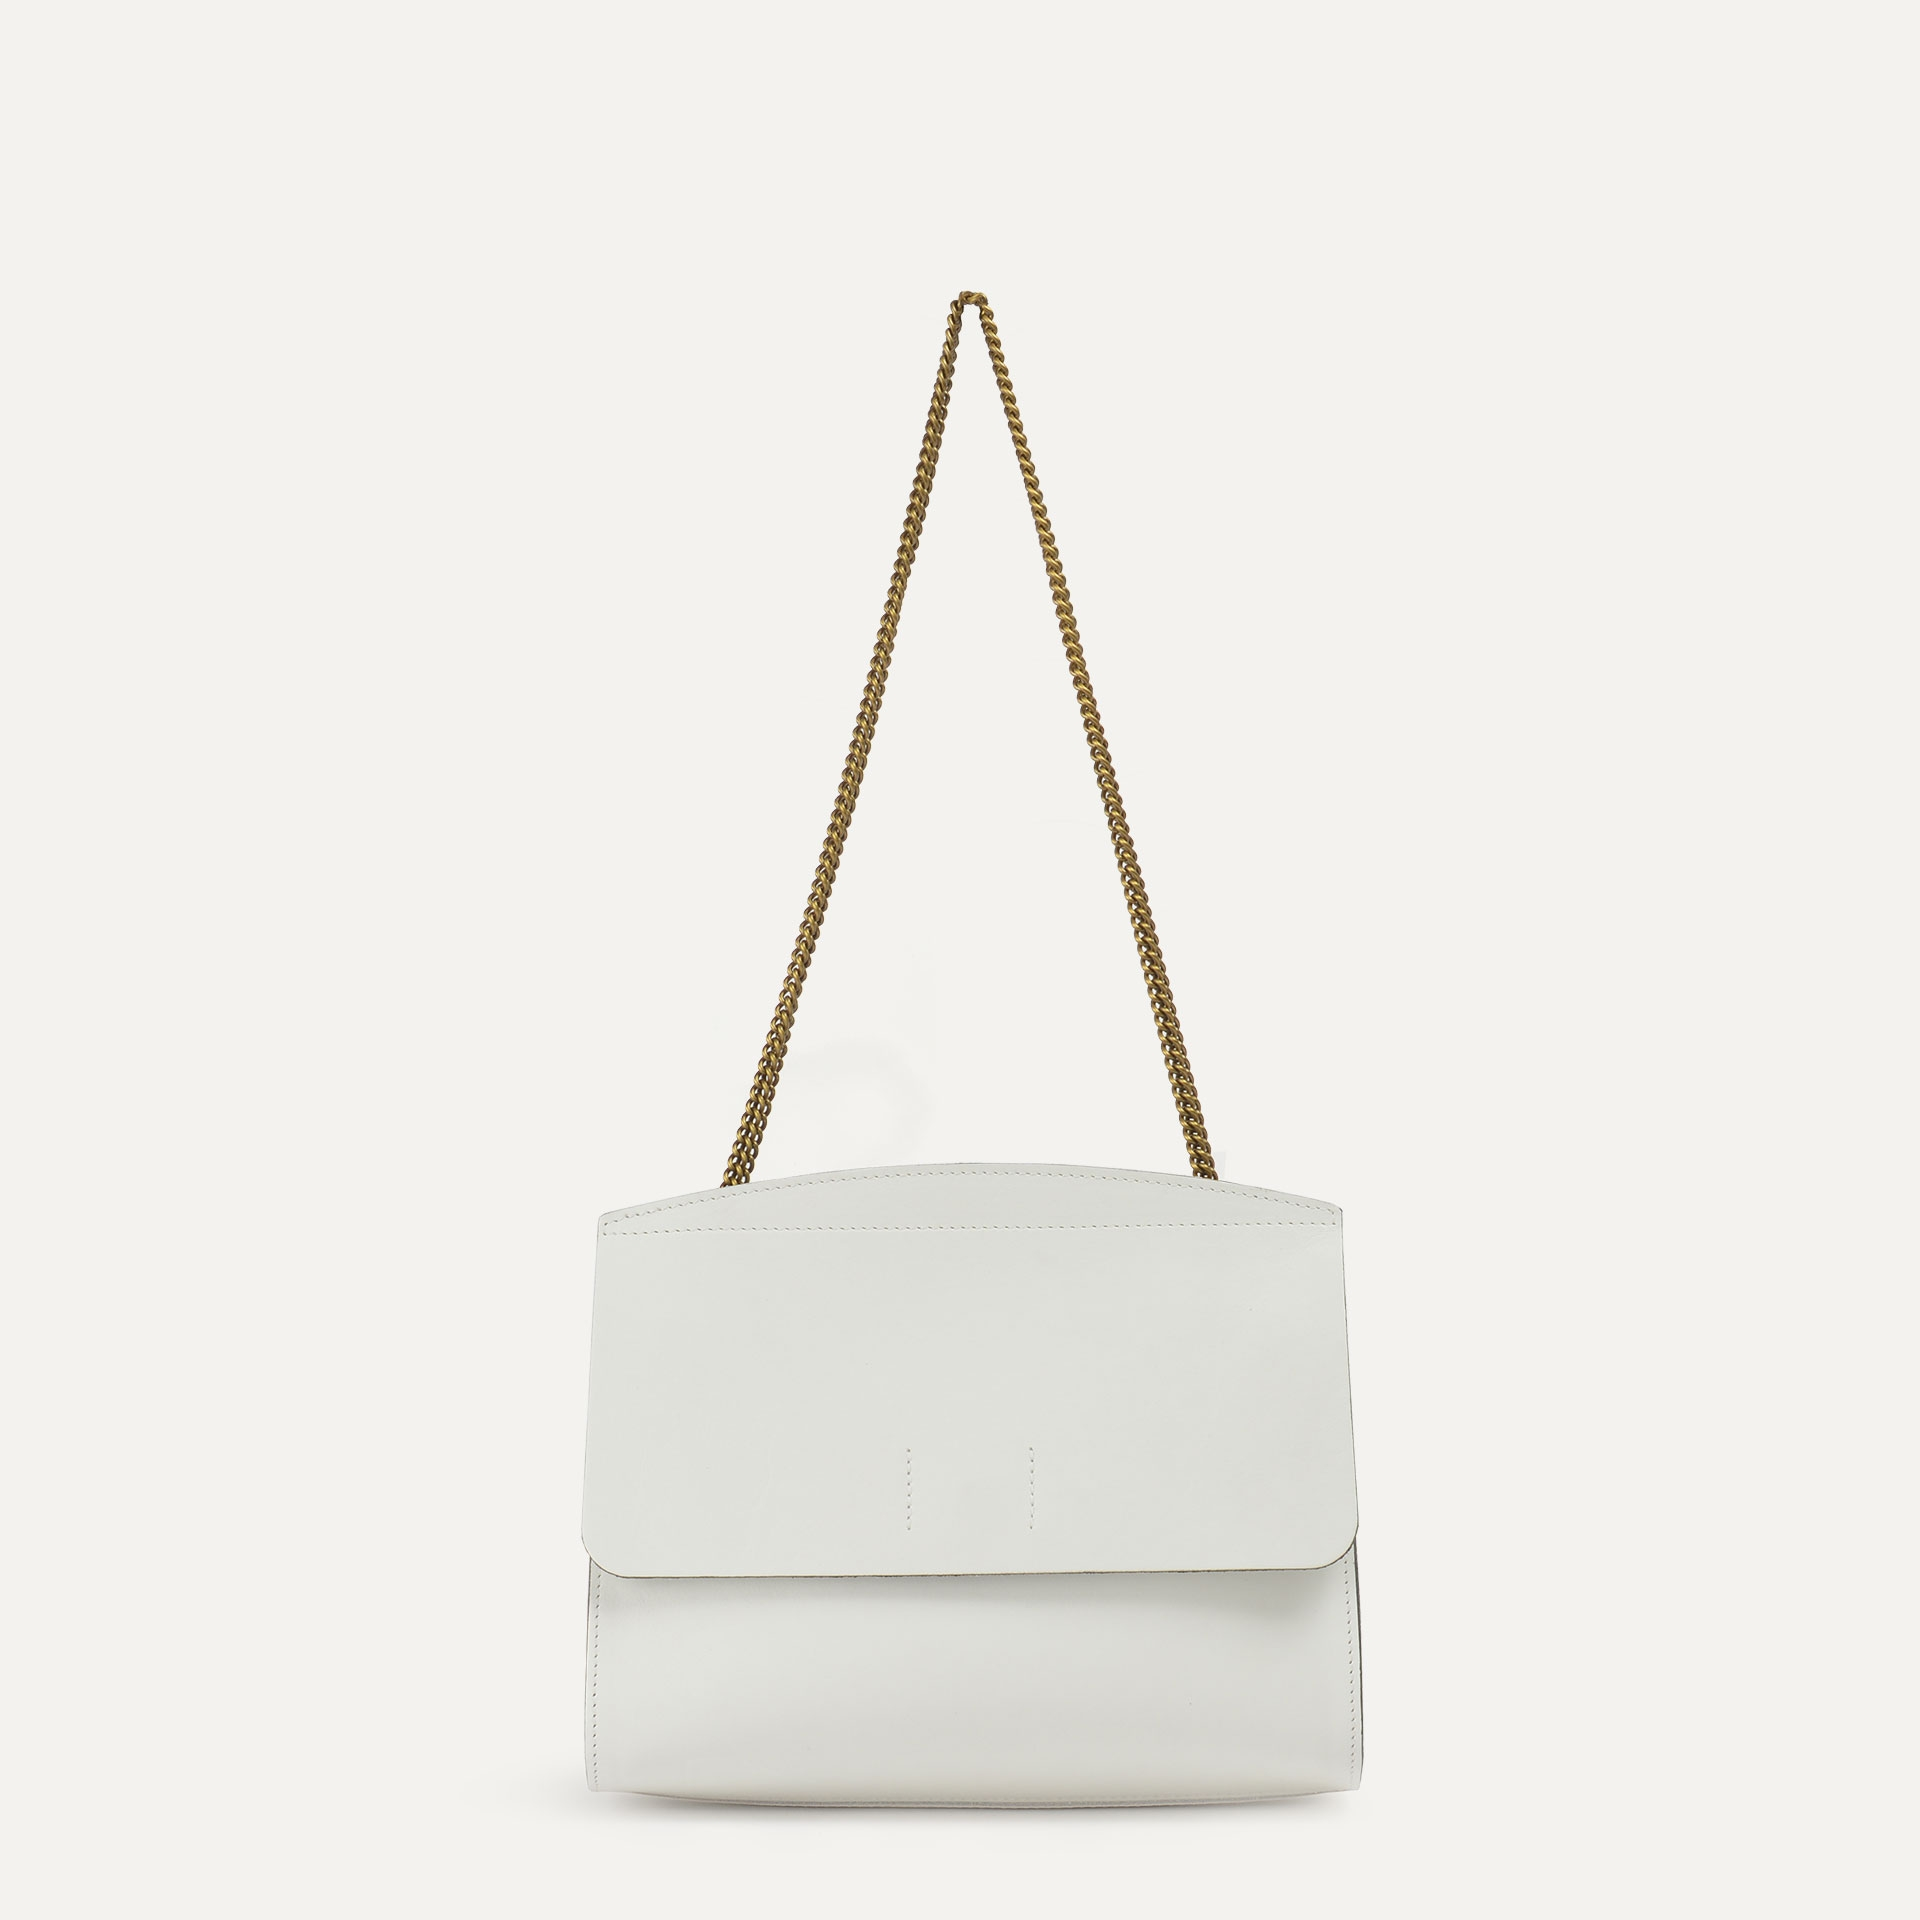 Origami S clutch bag - White (image n°3)